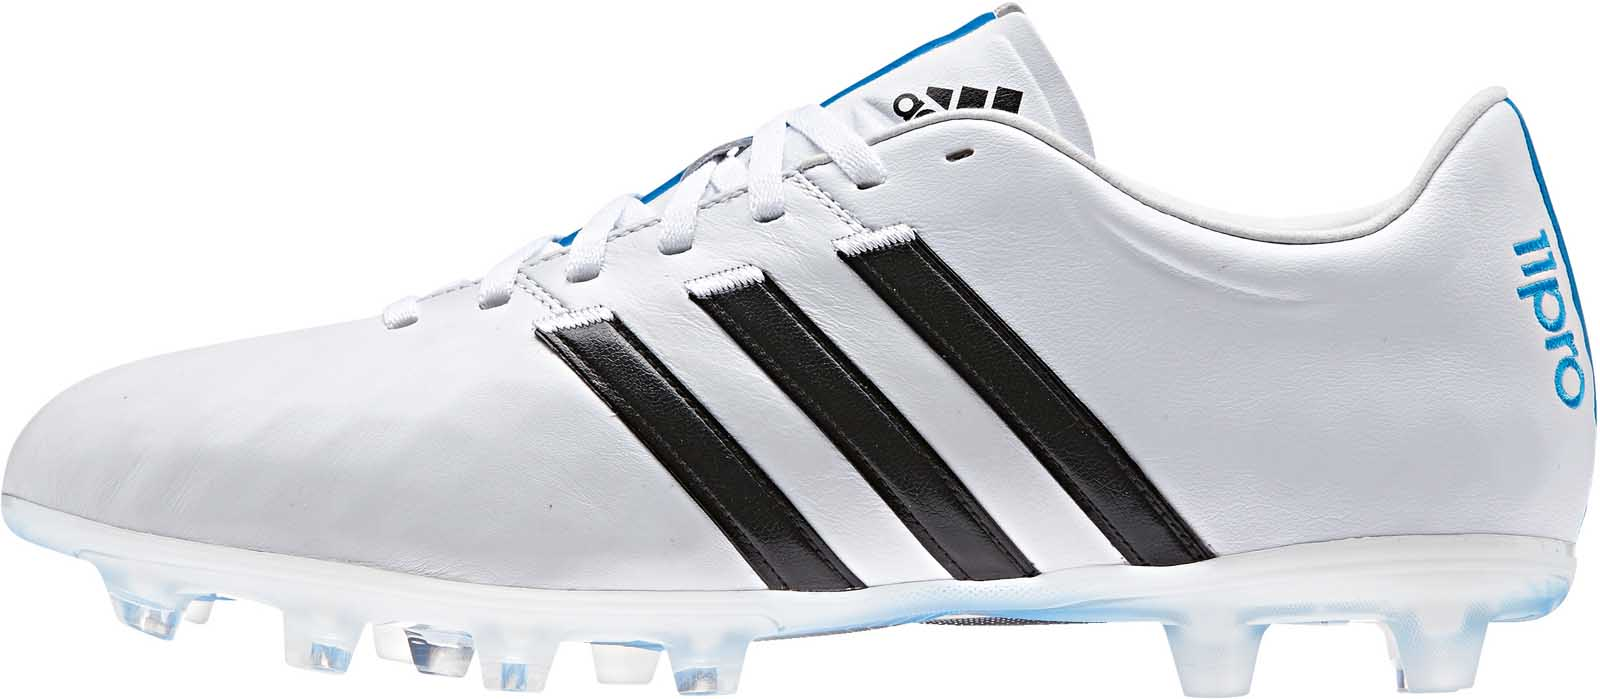 brand new dc237 08700 ... TRX FG Soccer Cleats (BlackWhiteSlime) Adidas Adipure 11pro White Black  Solar Blue ...